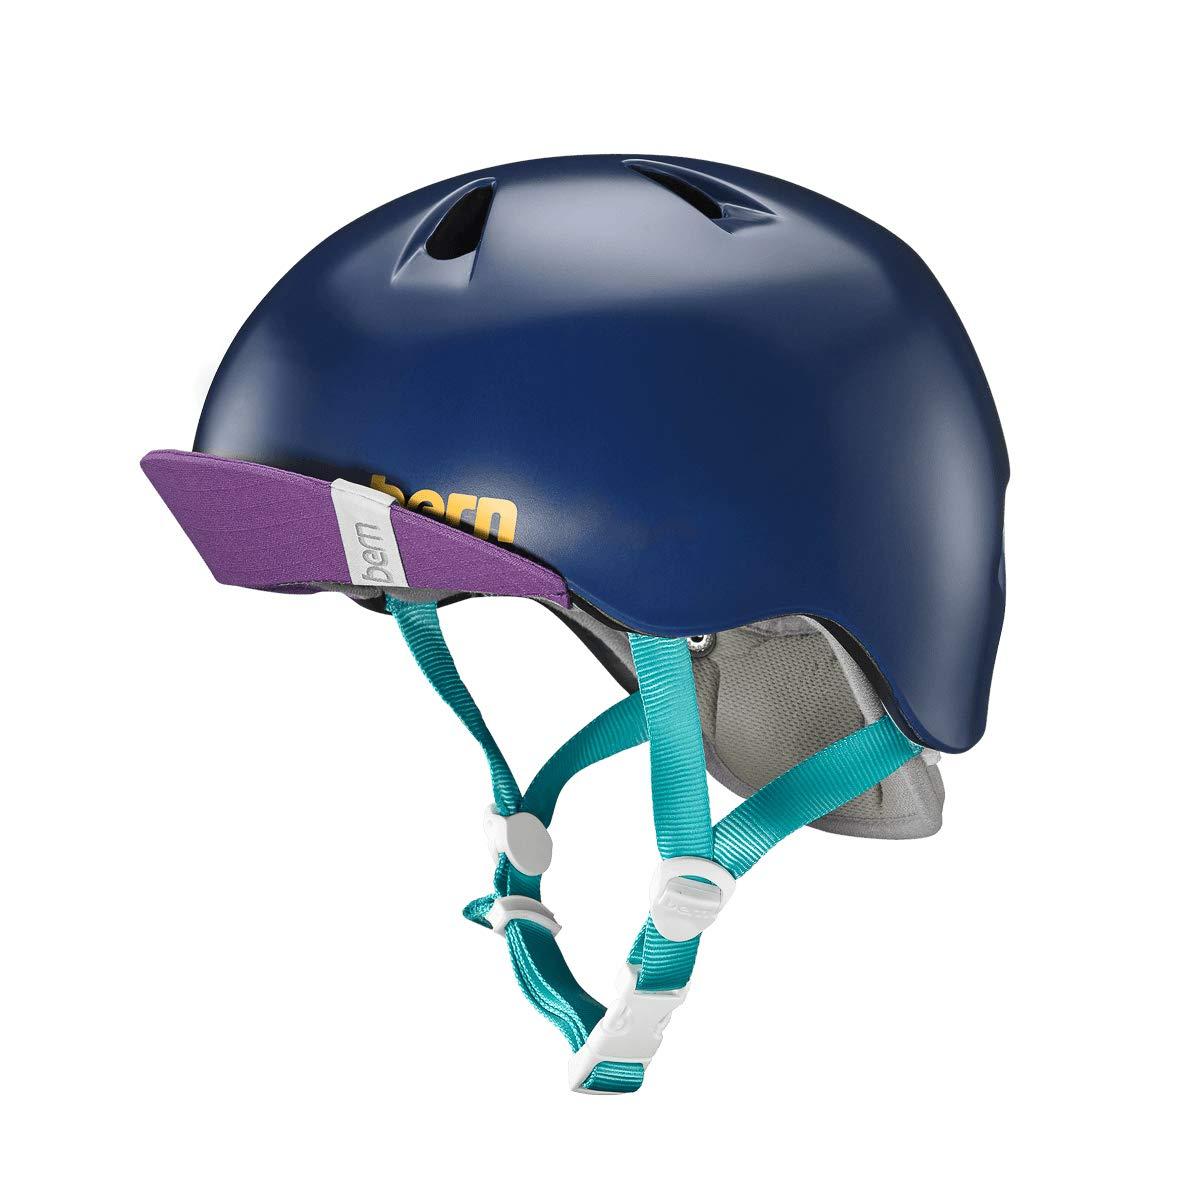 2017 Nina Satin Navy Blue w/ Flip Visor (XS/S)